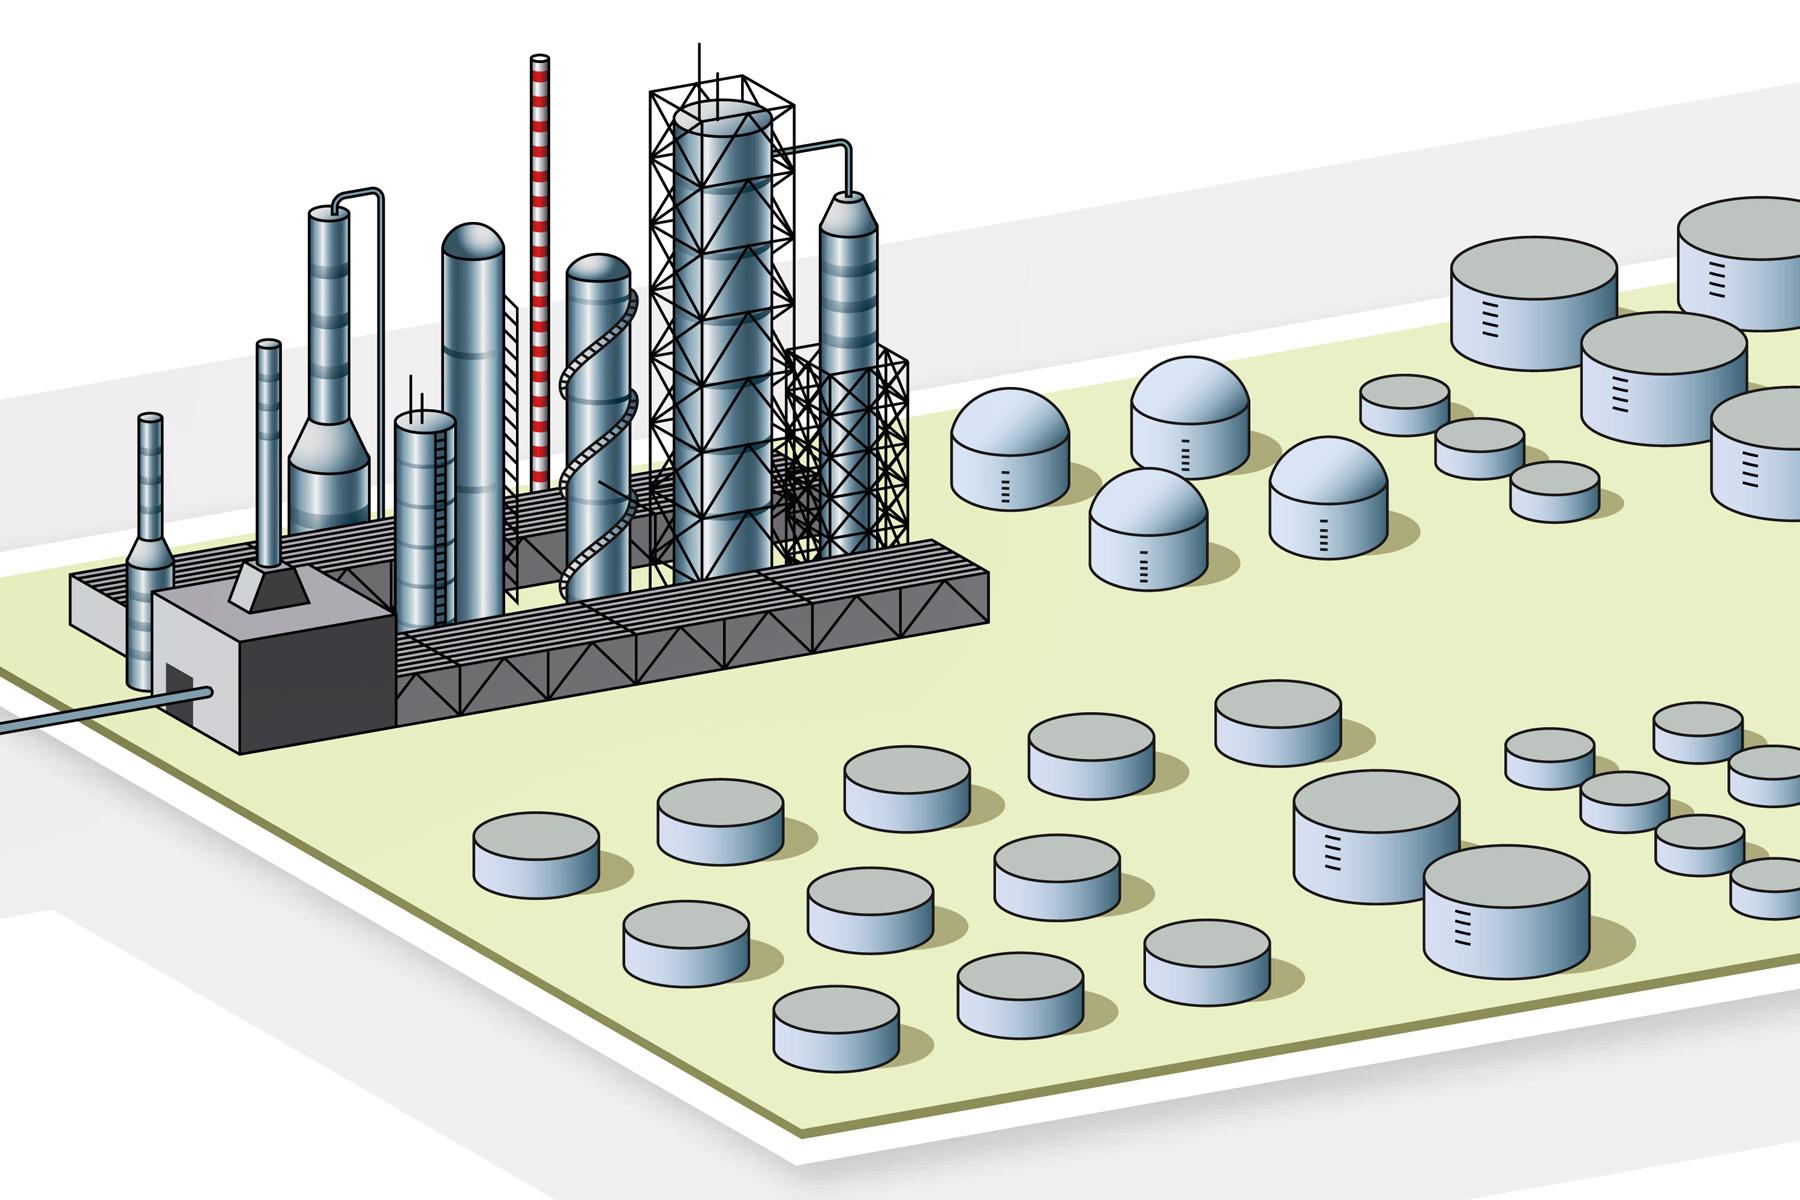 ABB_Refinery_1_1800x1200